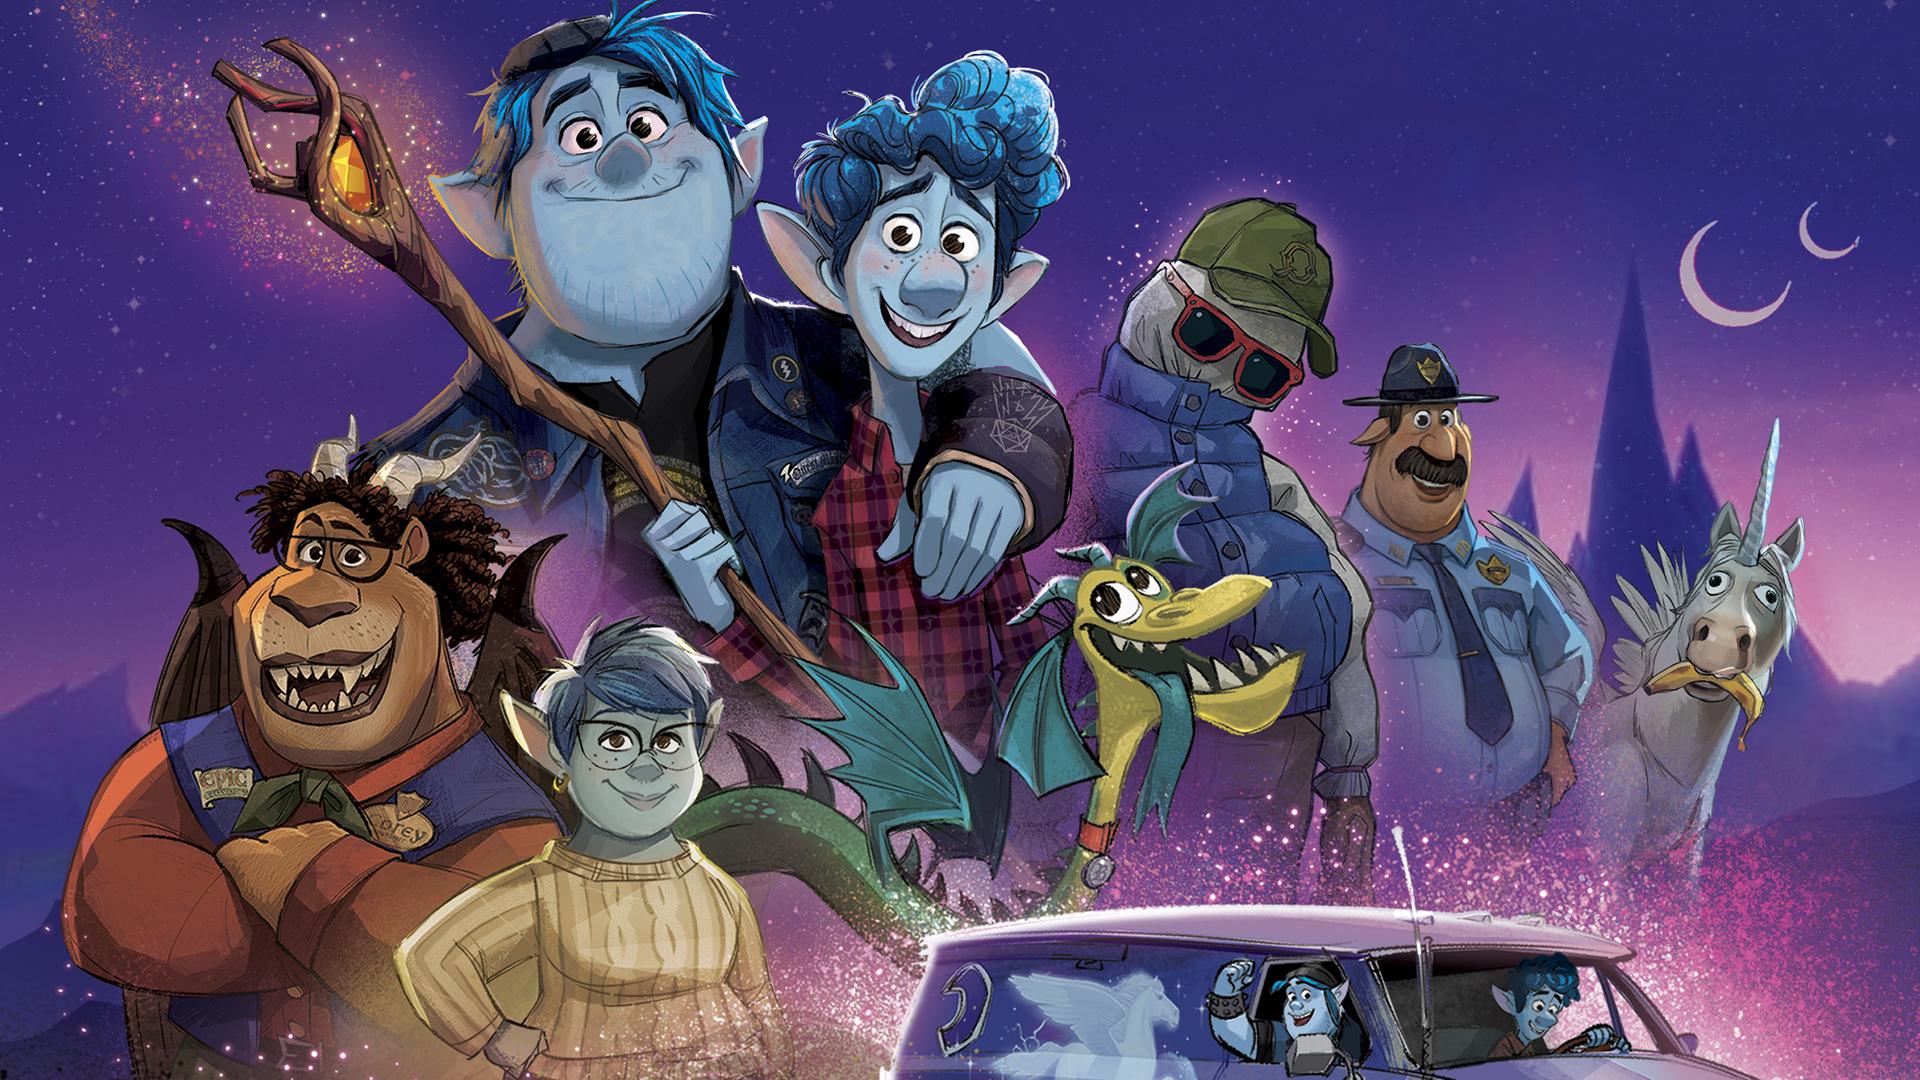 Pixar Onward HD wallpapers   YouLoveItcom 1920x1080